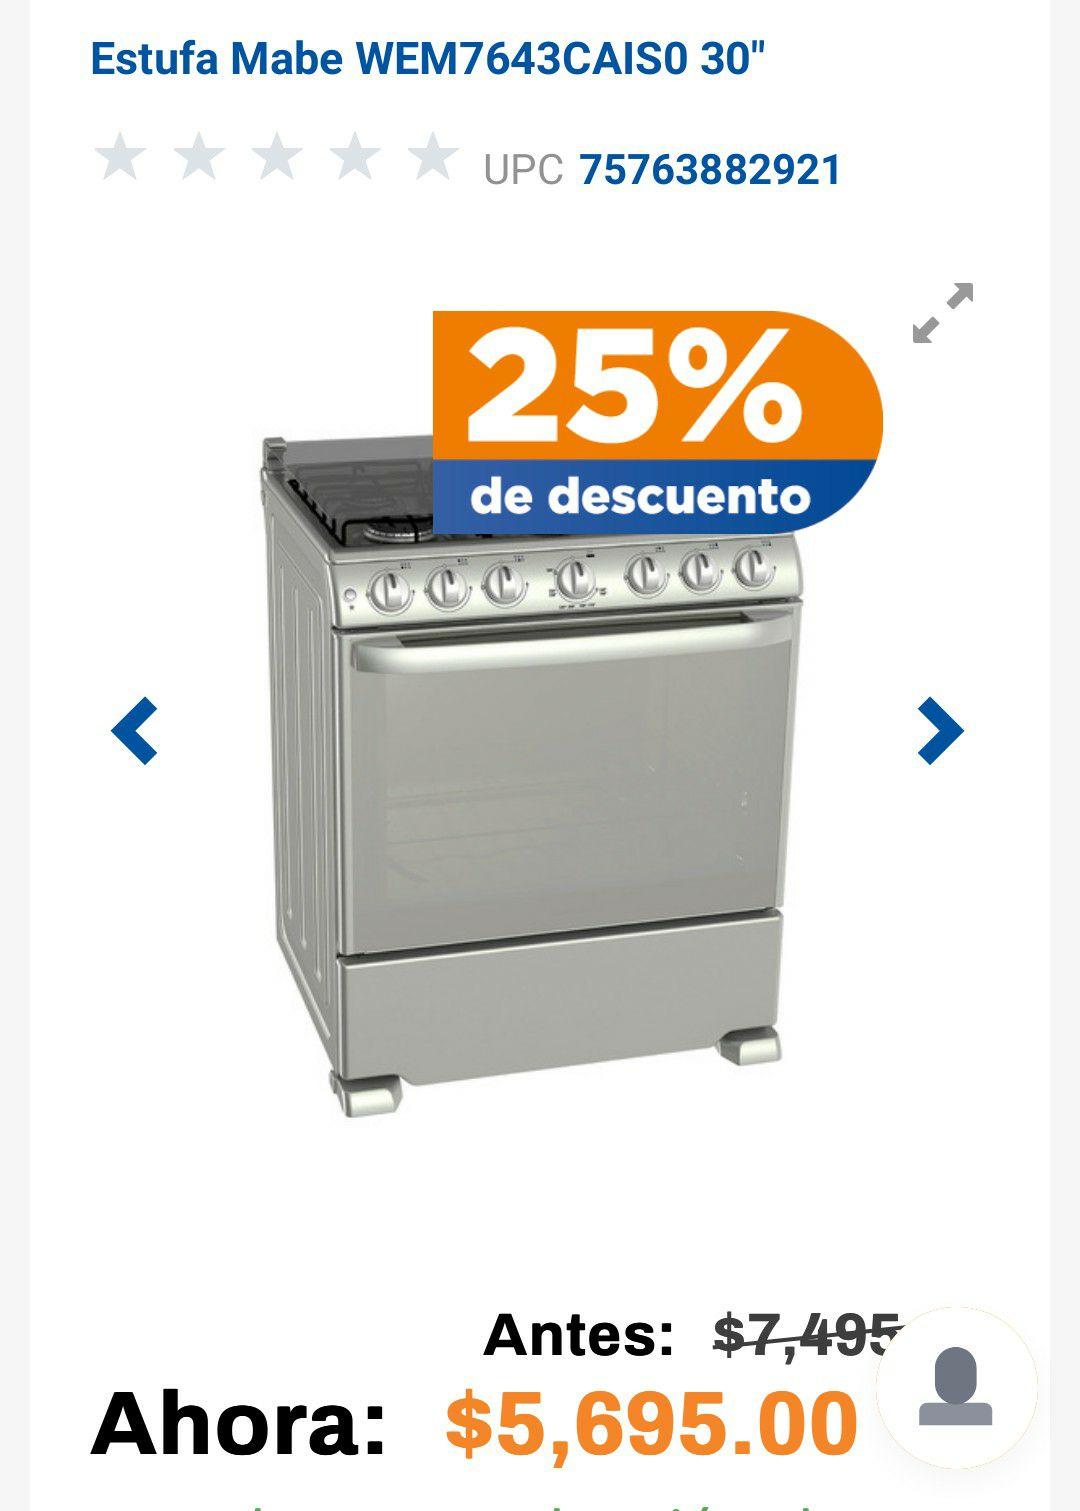 "Chedraui: Estufa Mabe WEM7643CAIS0 30"" a $4271.25"